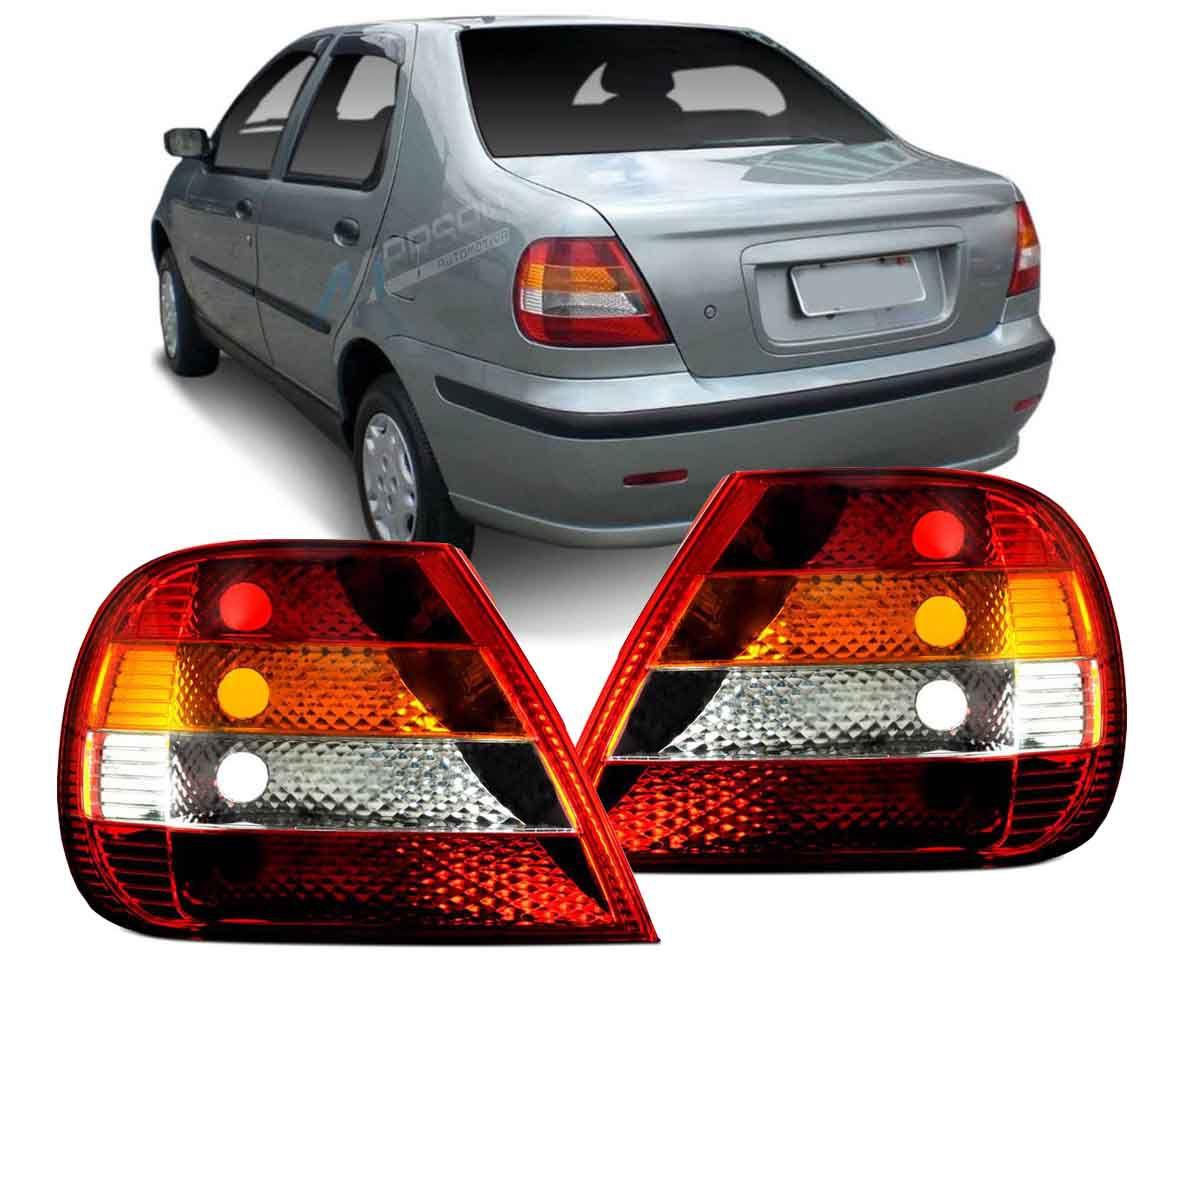 Par Lanterna Traseira Tricolor Fiat Siena 2001 2002 2003 2004 2005